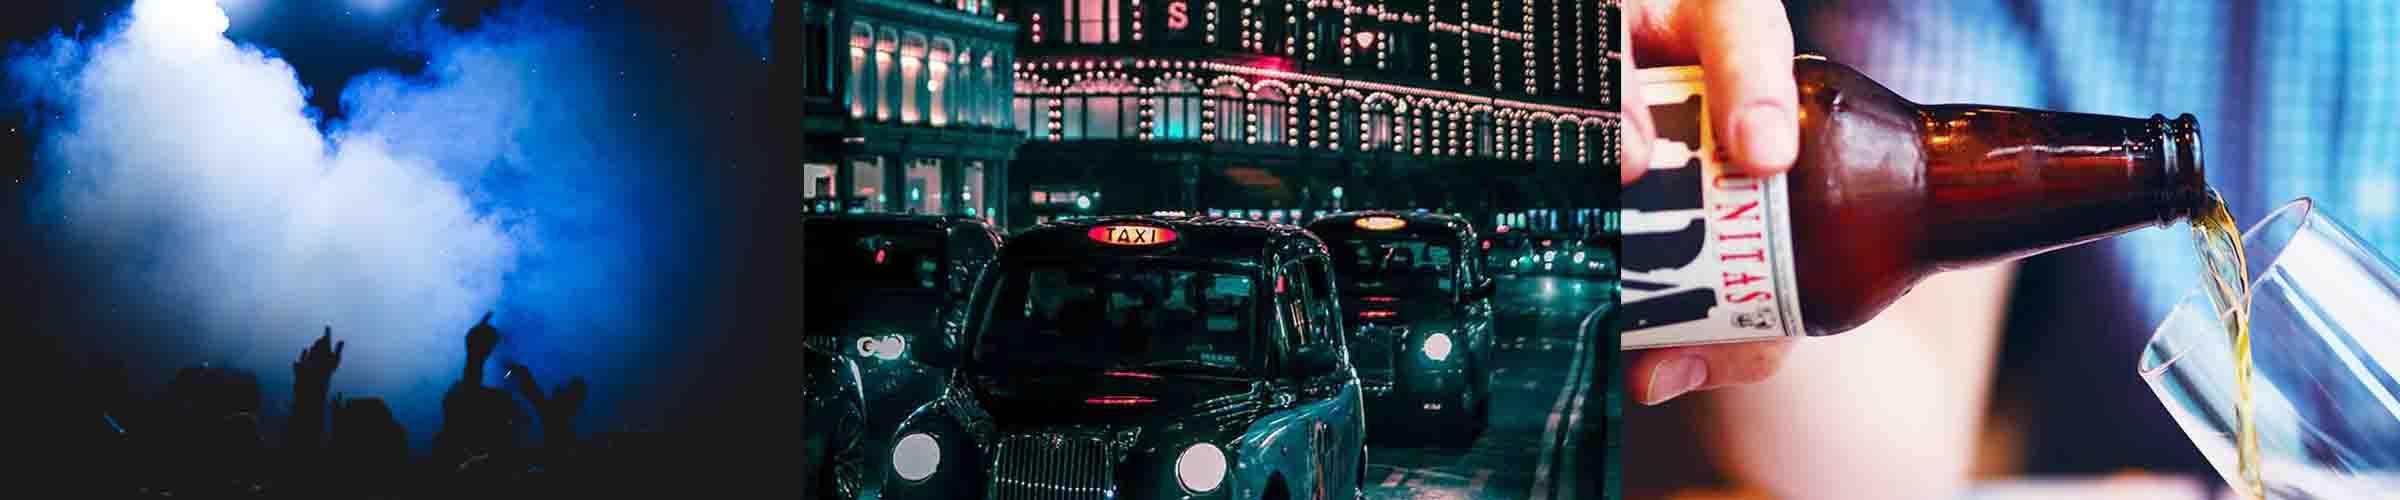 best london clubs